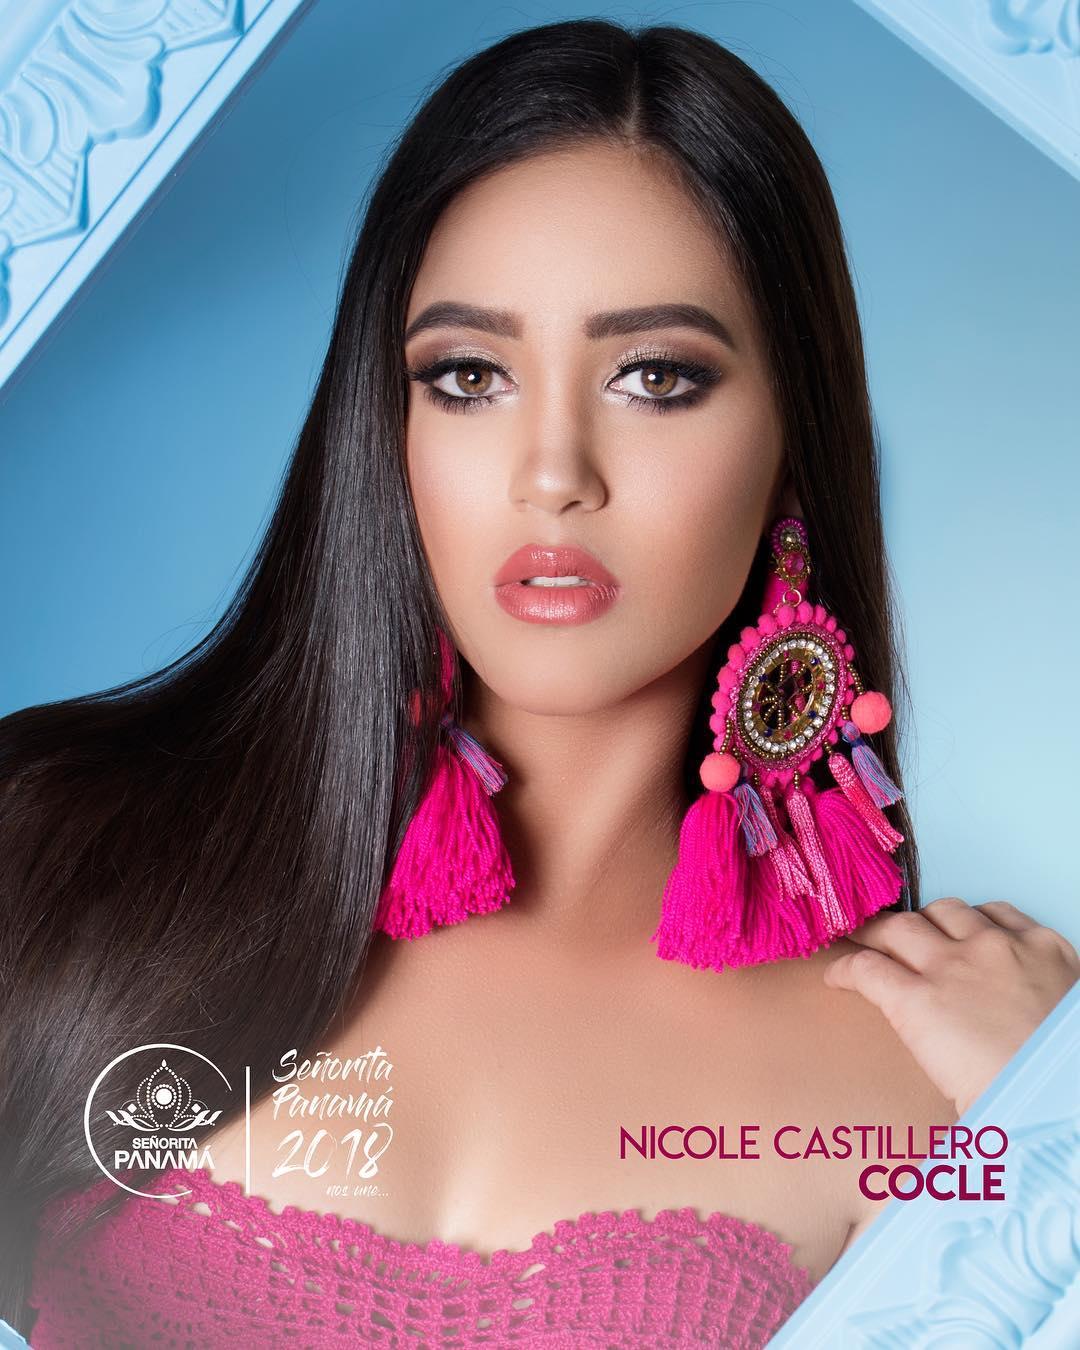 señorita miss colombia 2018 candidates candidatas contestants delegates Miss Coclé Nicole Castillero